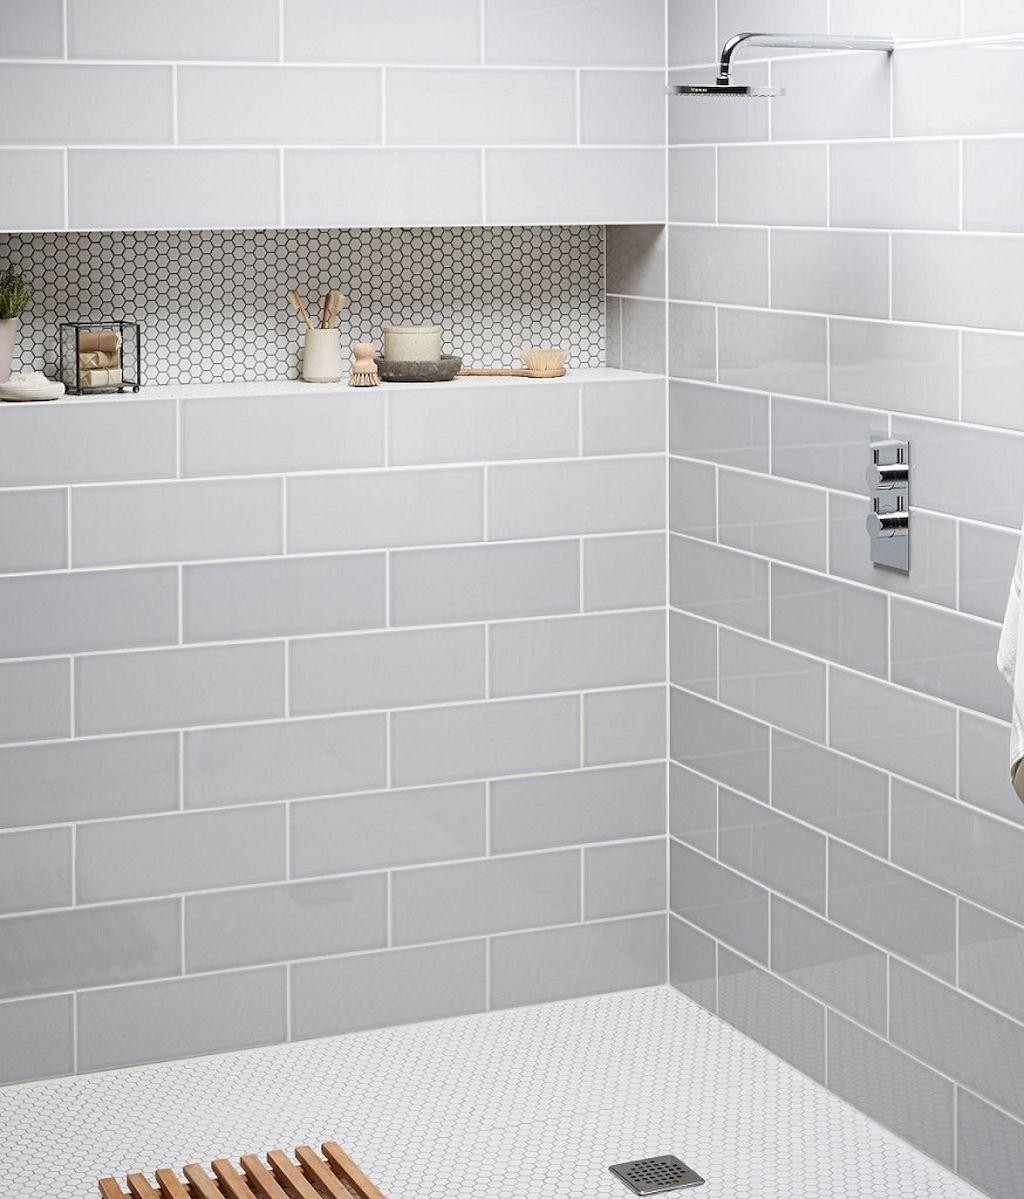 Beautiful Bathrooms With Bidet: 40 Beautiful Bathroom Shower Tile Design Ideas And